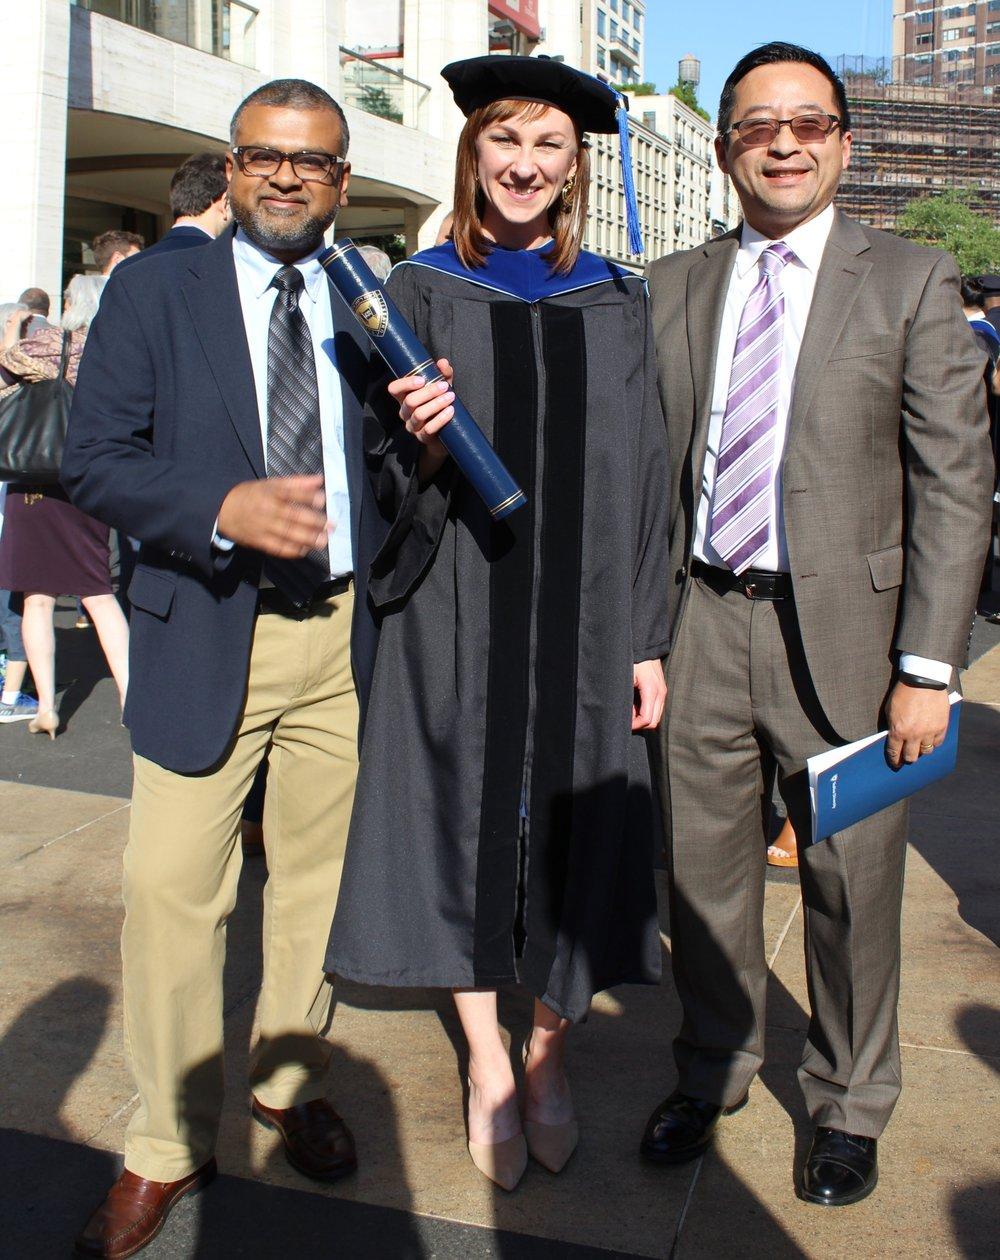 Kartik Chandran, Ph.D., Anna Wec, Ph.D., and Jonathan Lai, Ph.D.